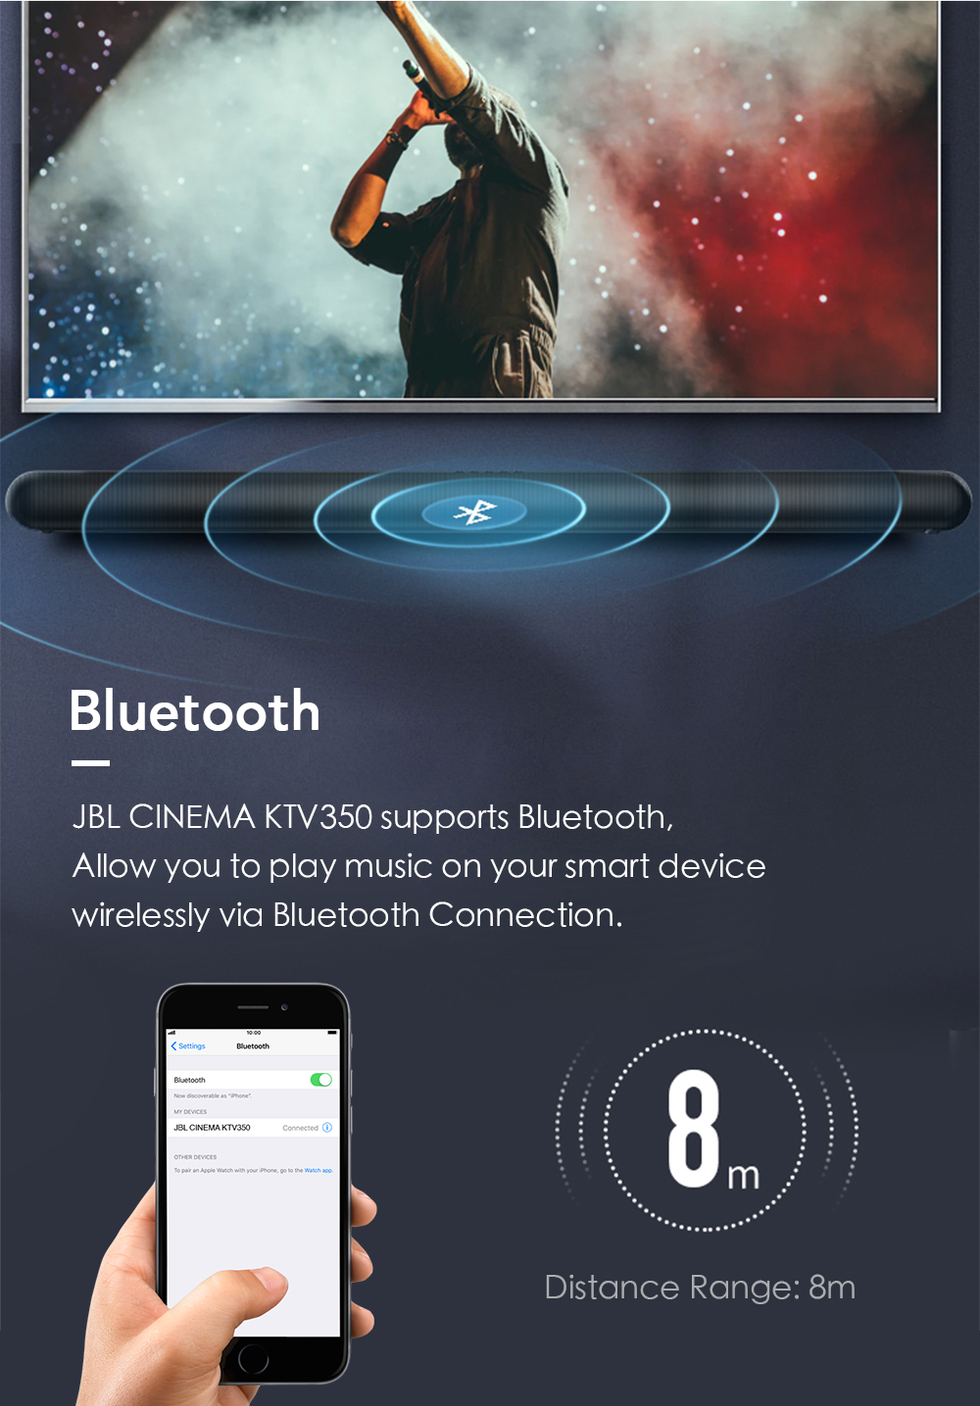 JBL-CINEMA-KTV350-Catalogue-(ENG)6.png